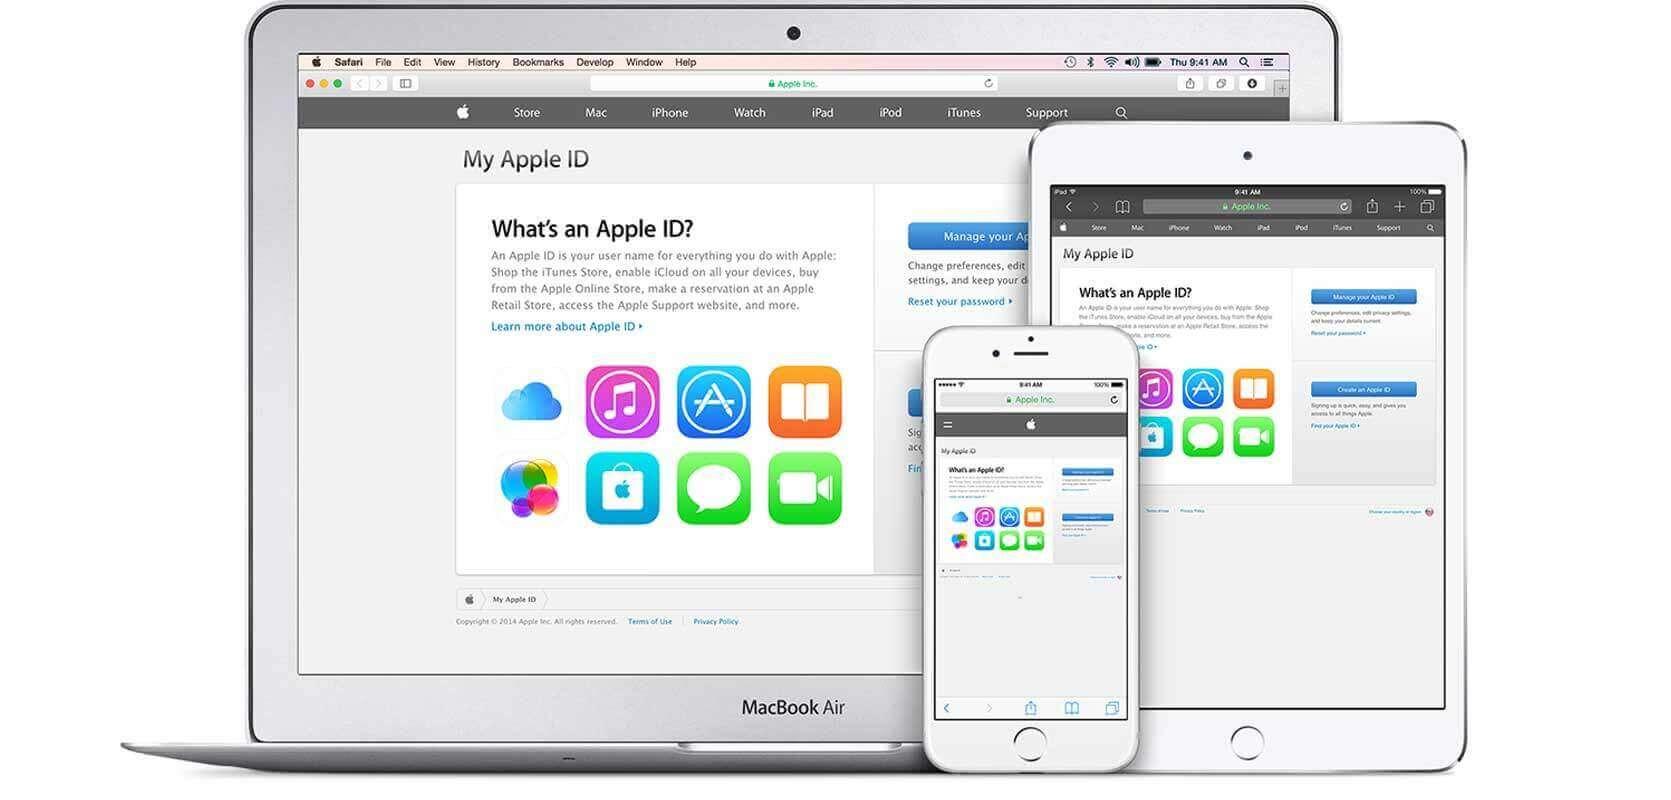 MyAppleID - Fique atento aos popups que pedem seu Apple ID